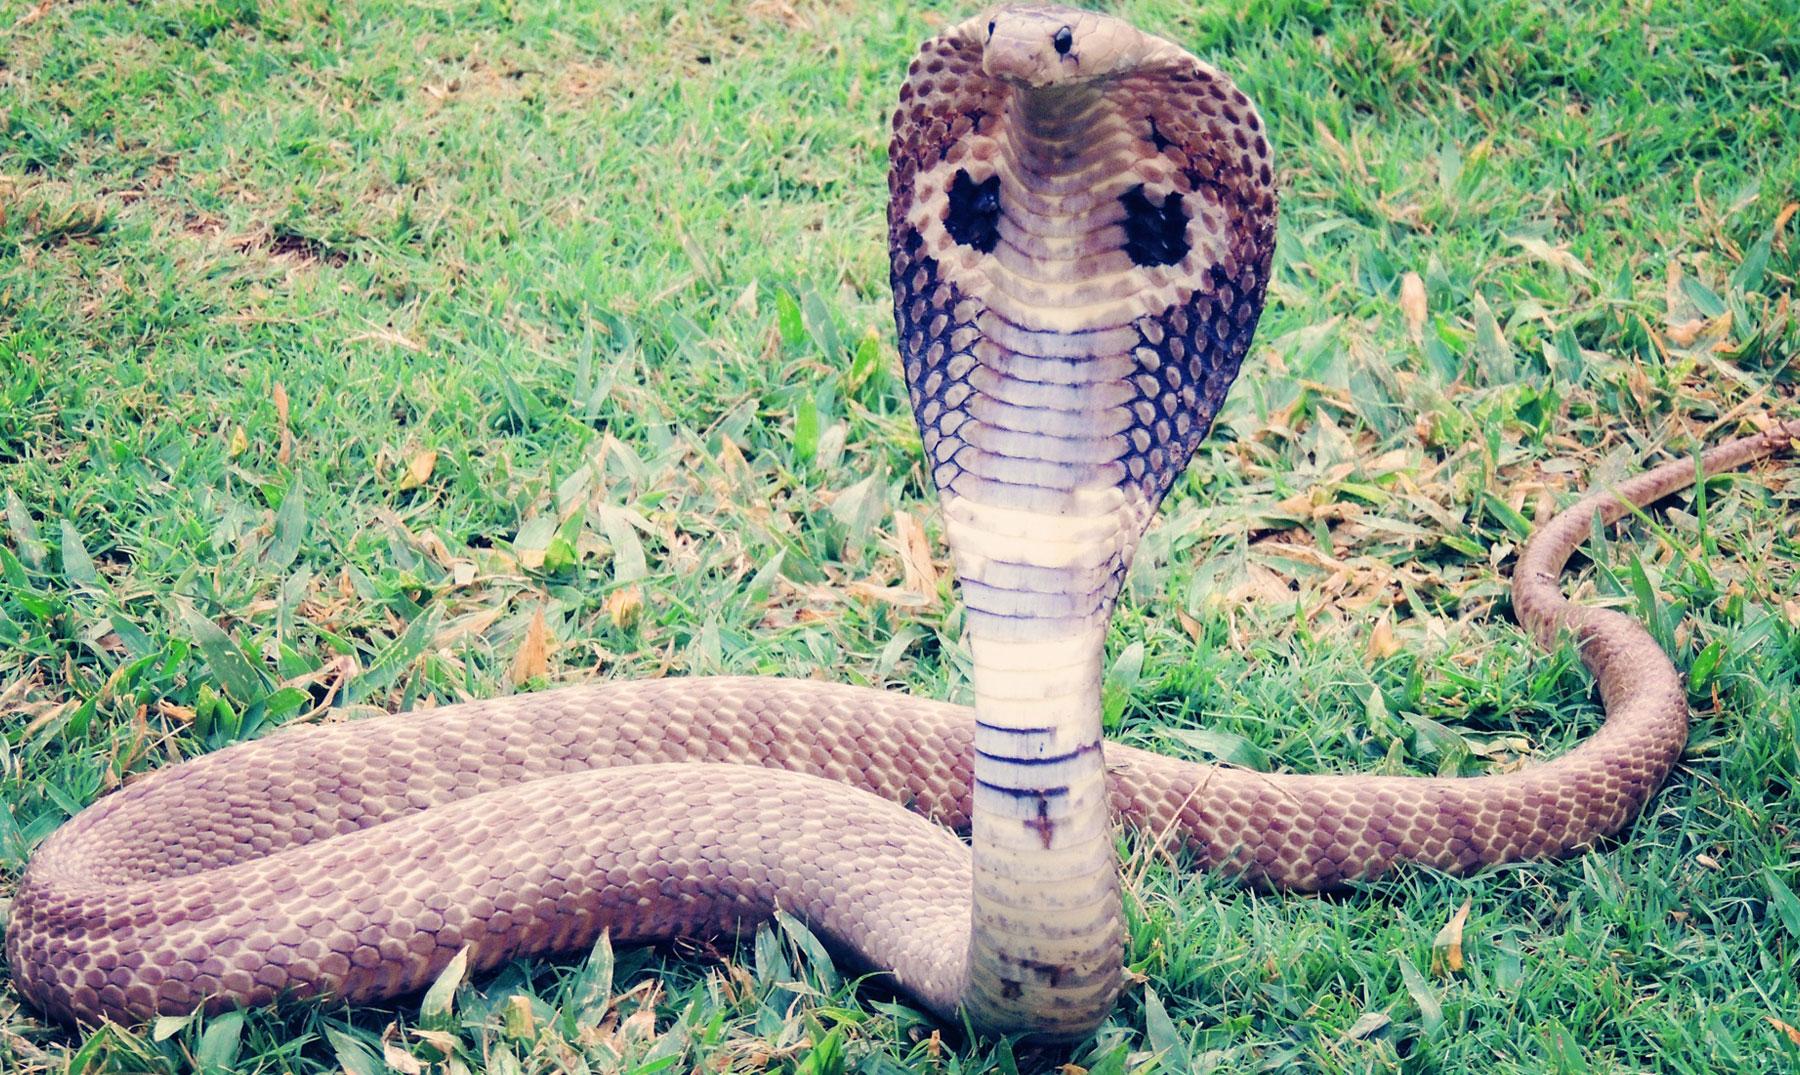 La impresionante Isla de las Cobras